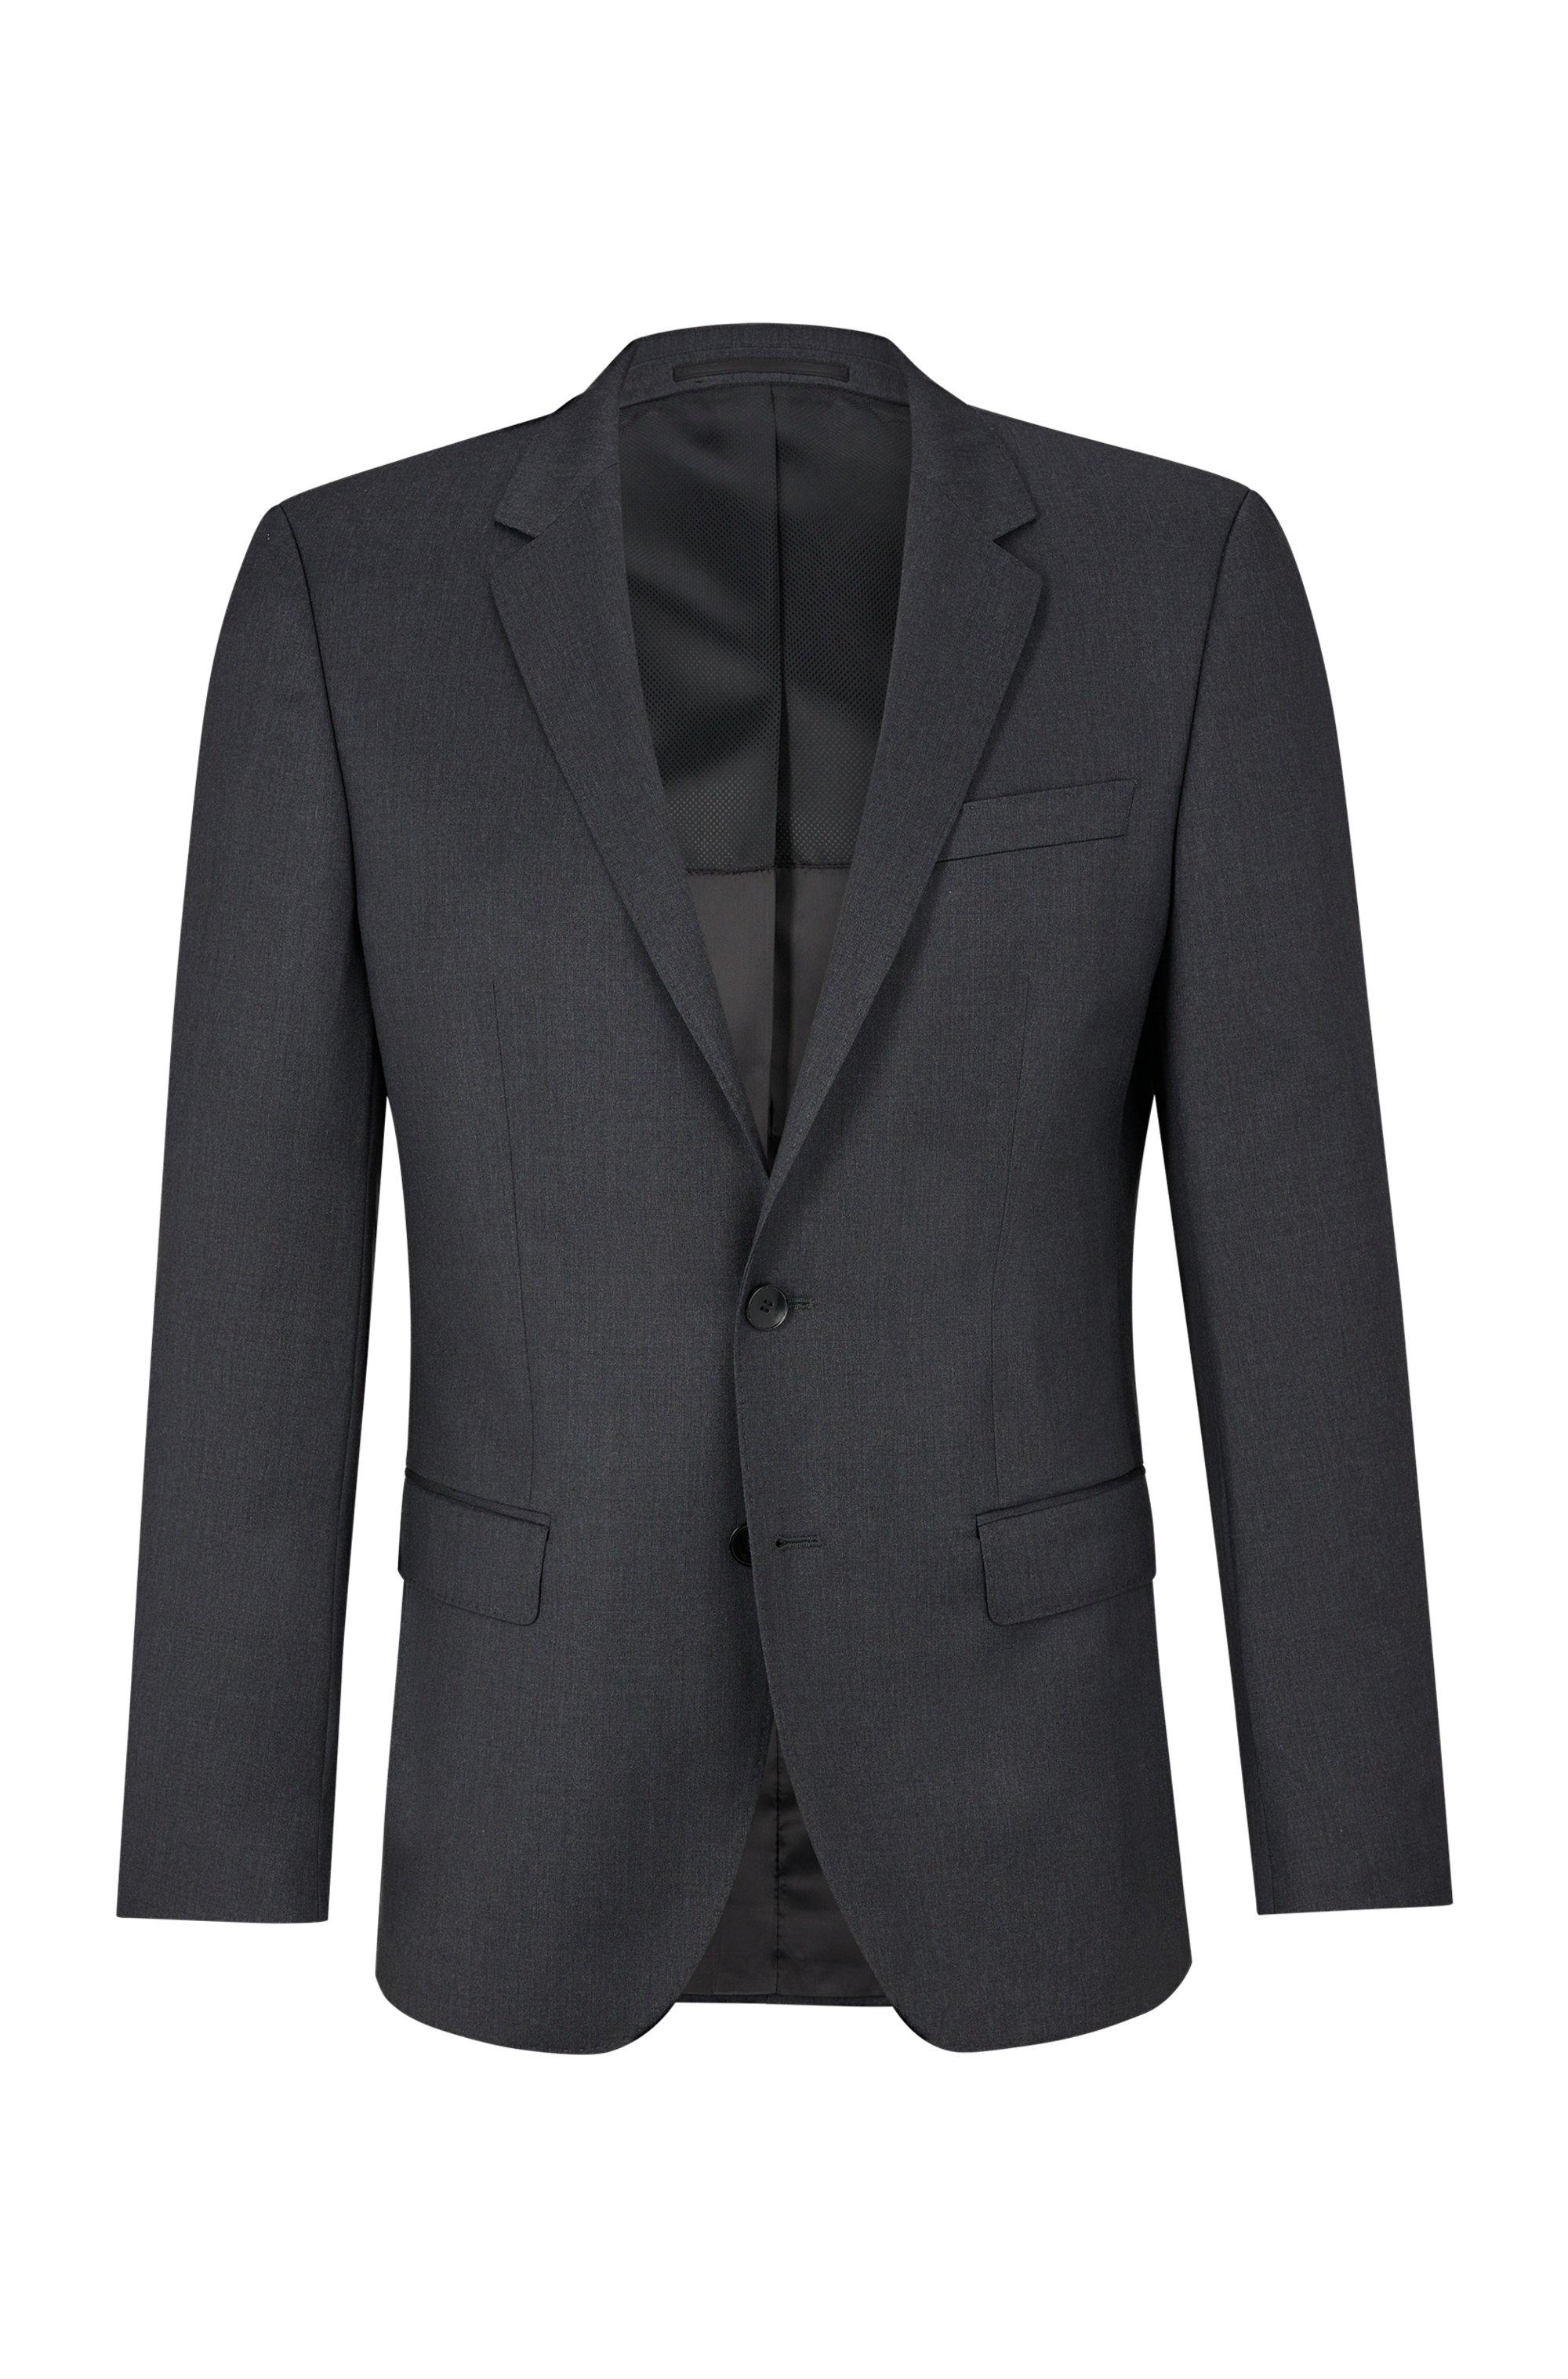 Giacca slim fit in serge di lana vergine con cuciture AMF, Grigio scuro